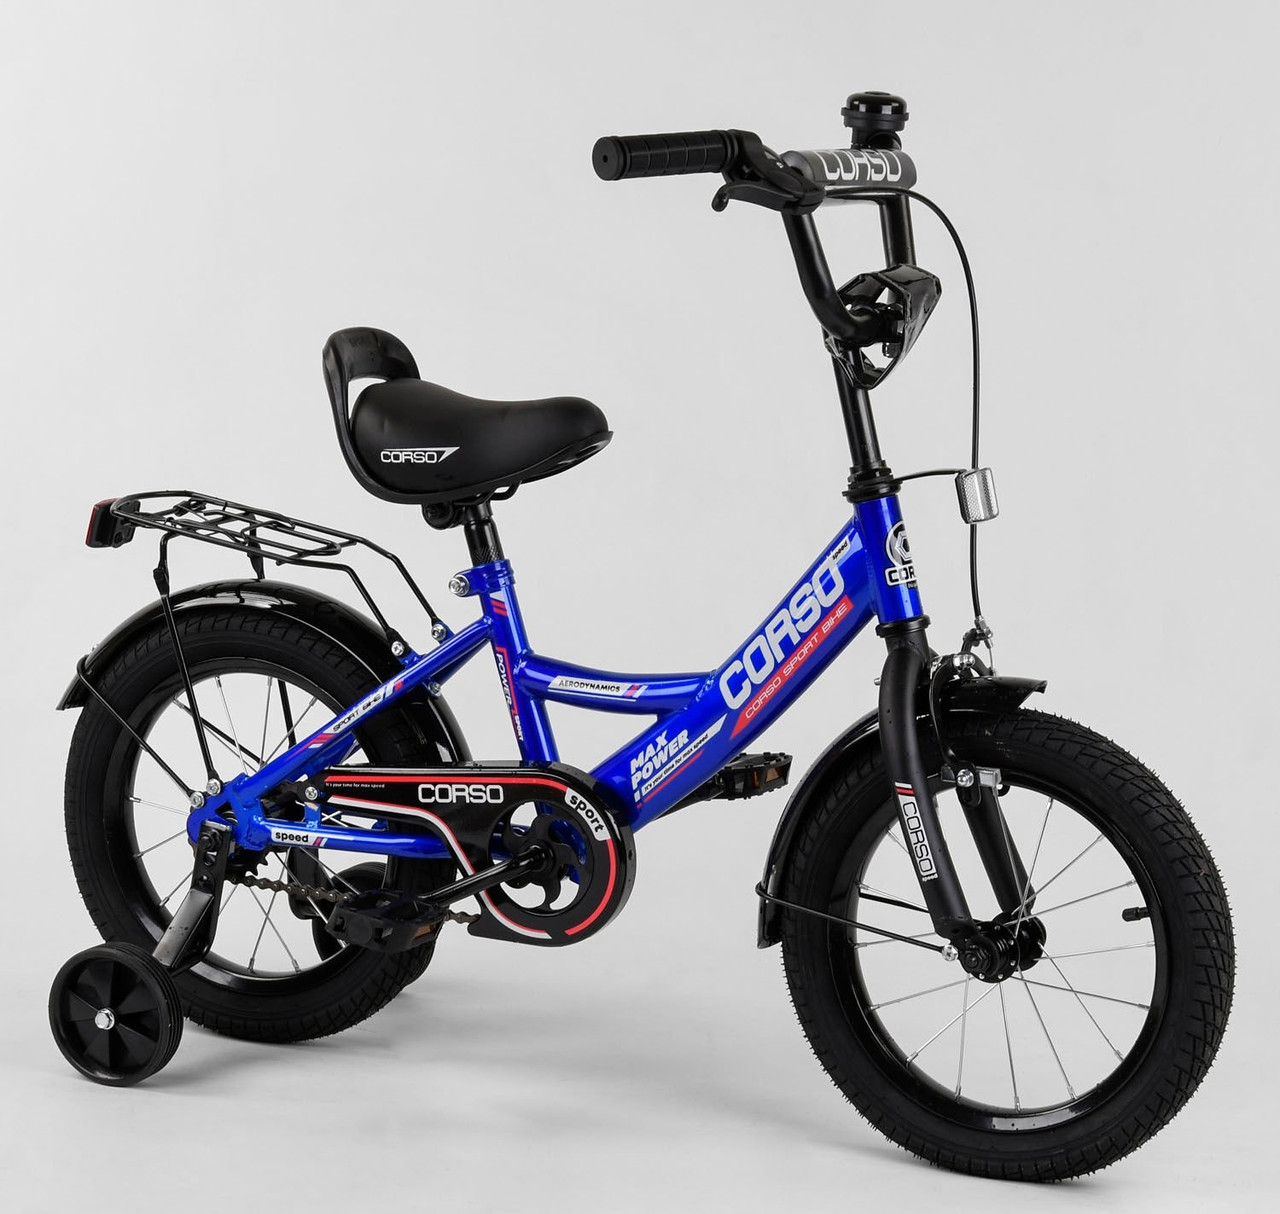 Велосипед дитячий 14004 Corso CL 14 дюйма